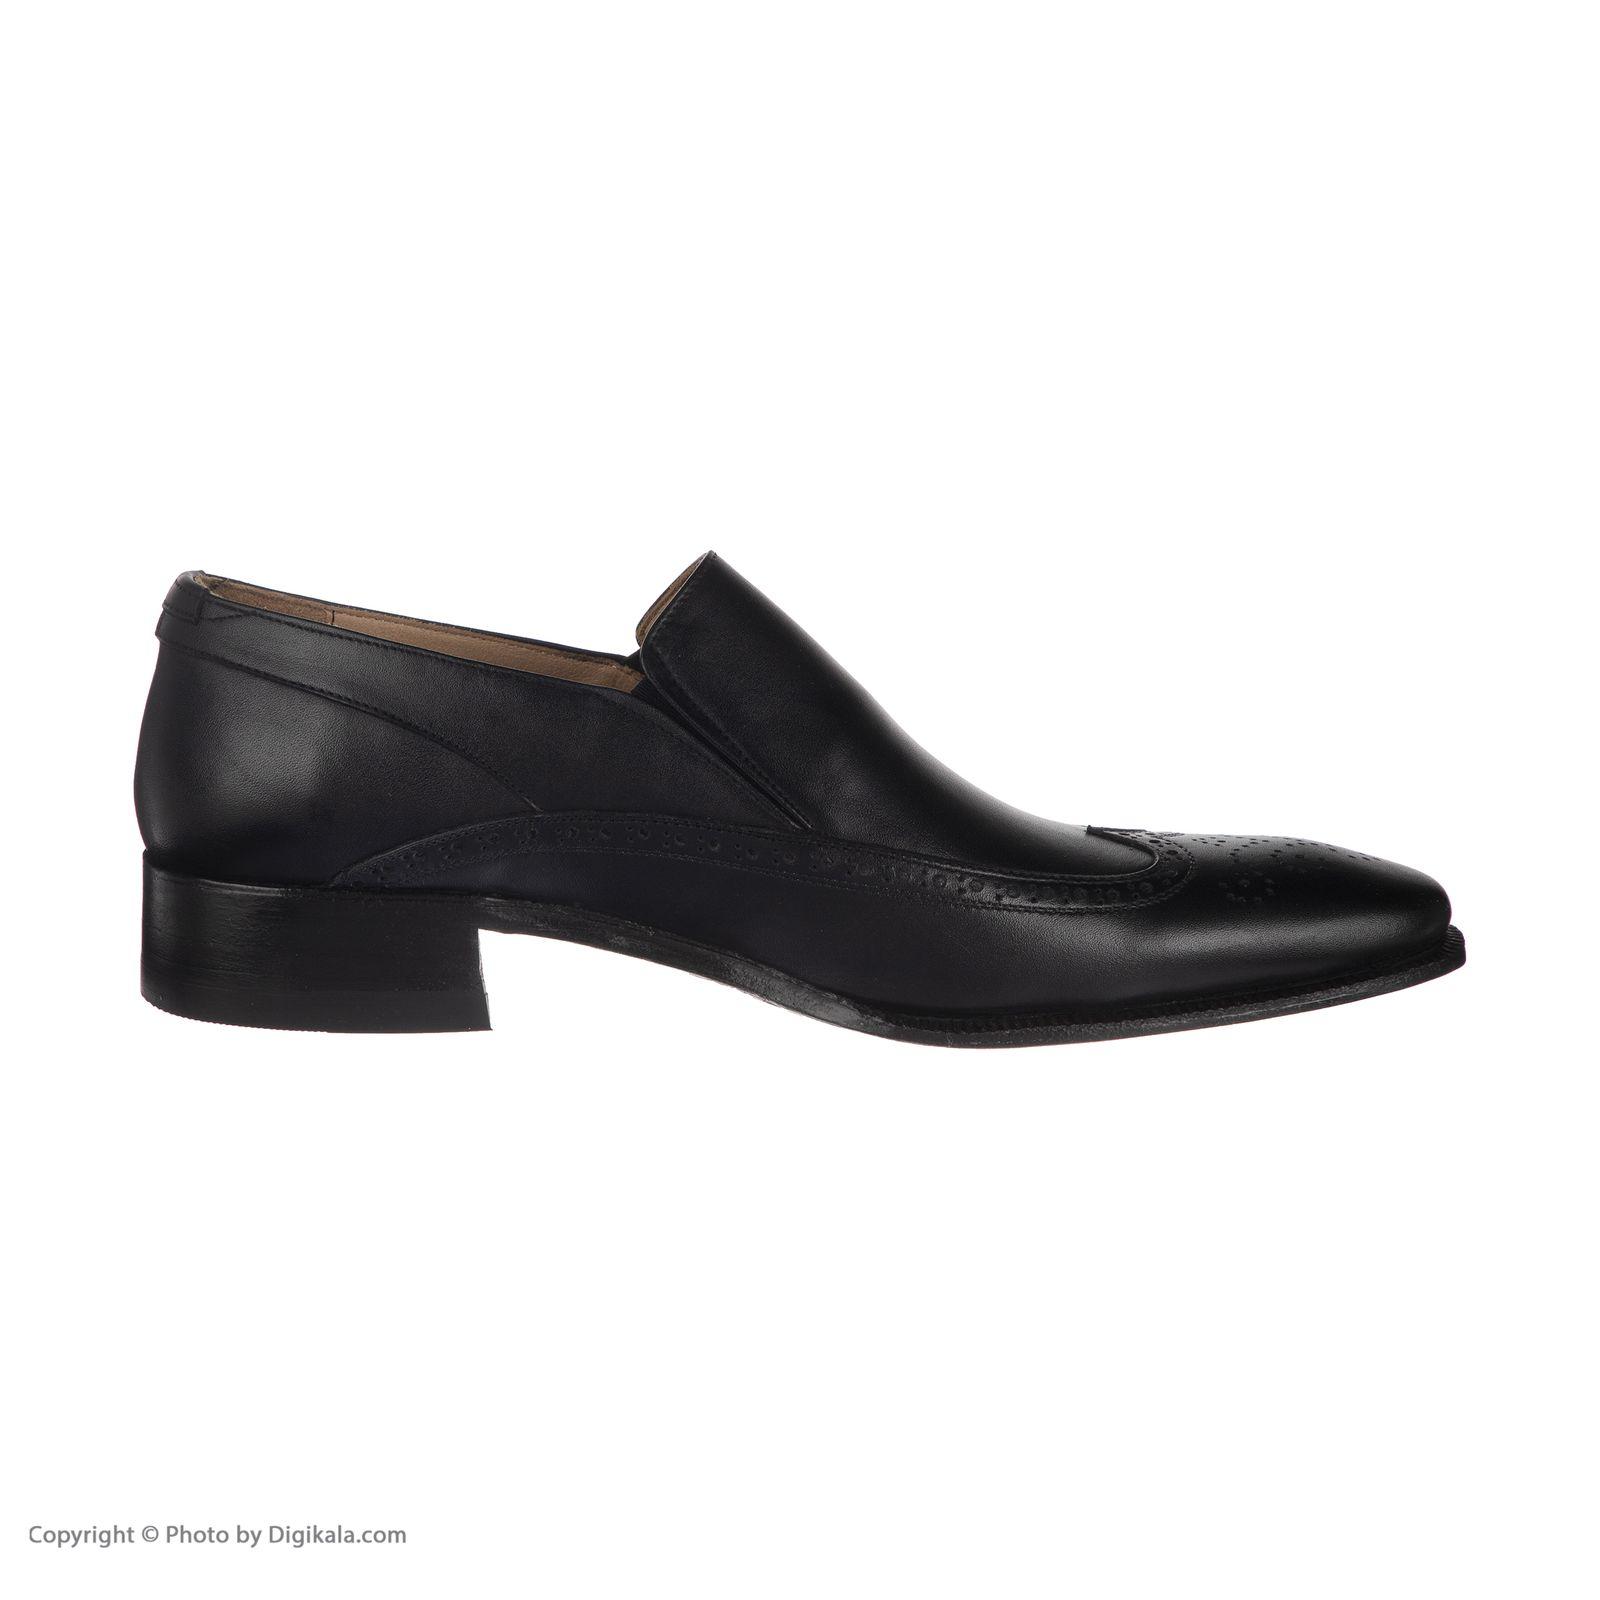 کفش مردانه نظری کد 435 -  - 2